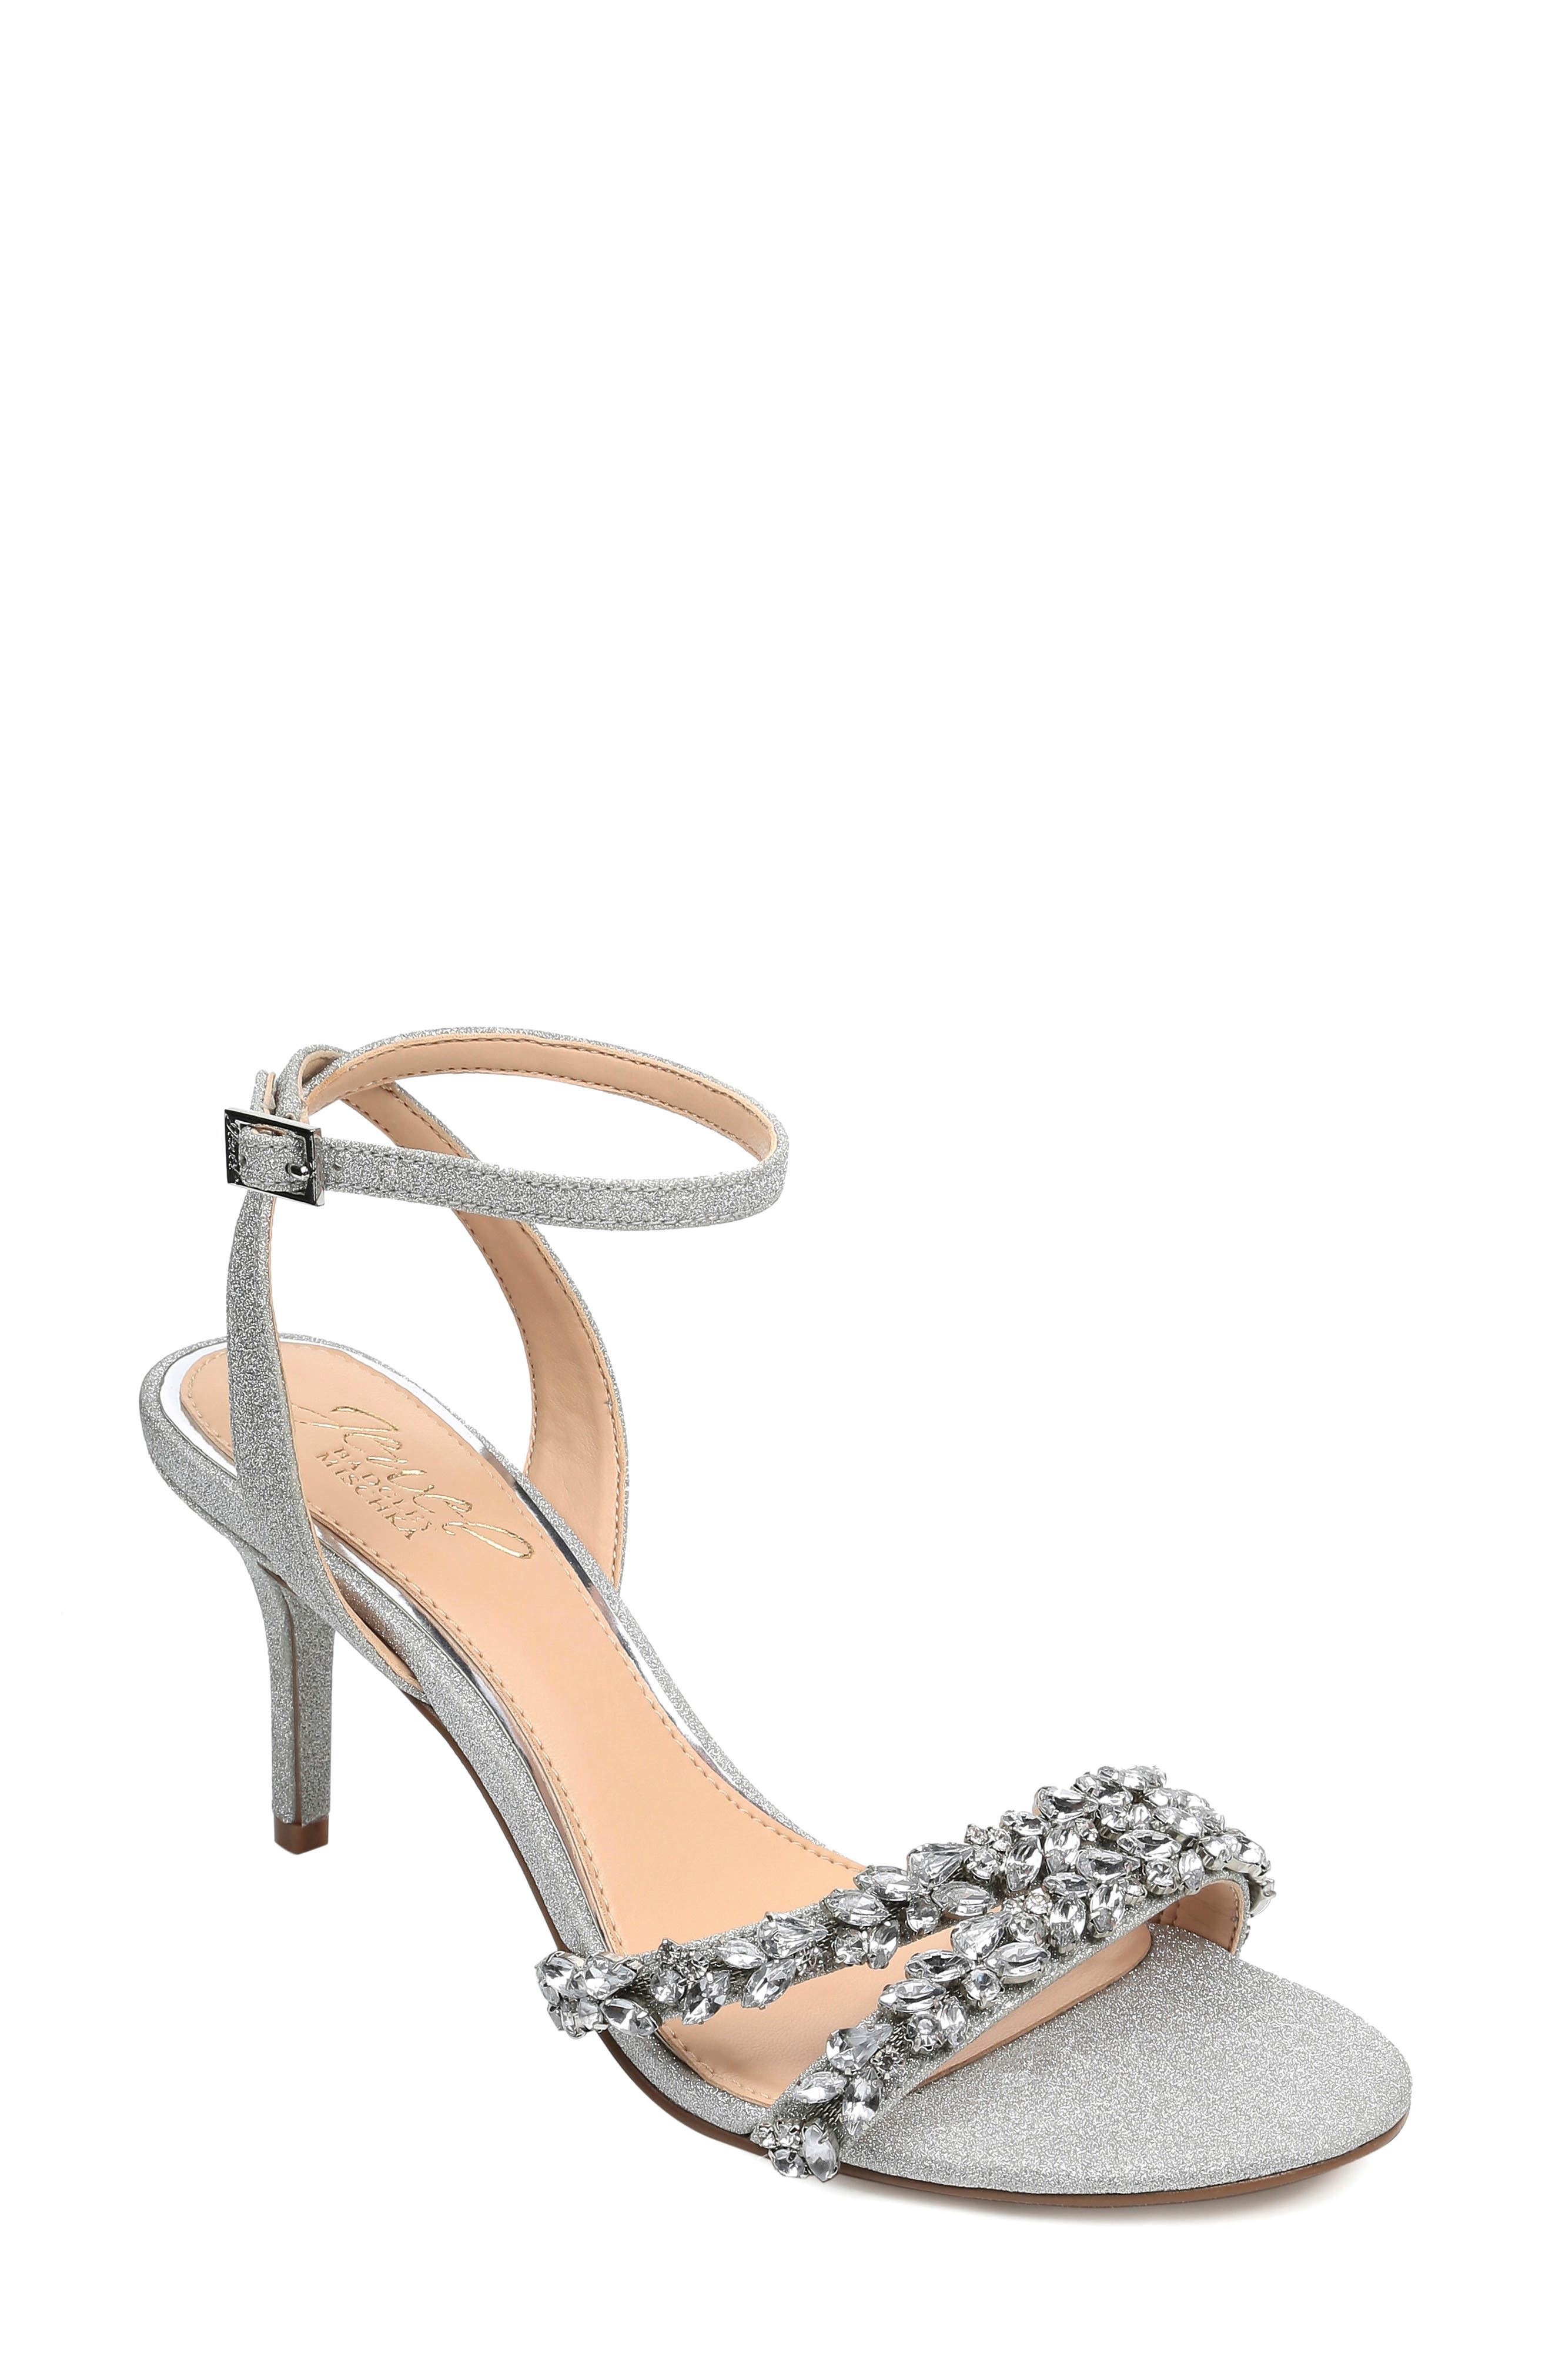 Jewel Badley Mischka Jarrel Ankle Strap Sandal, Metallic